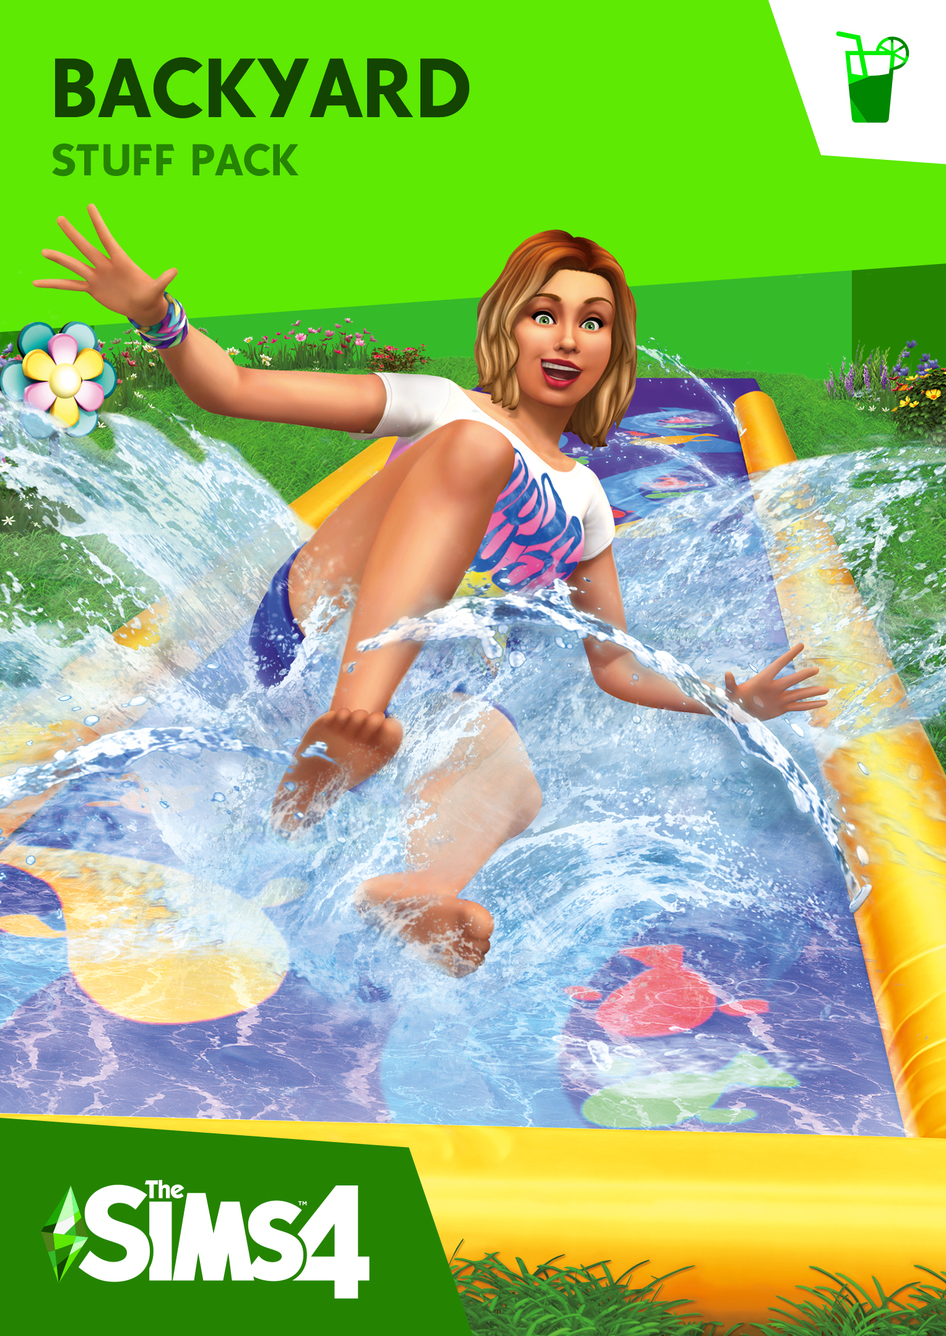 The Sims 4 Backyard Stuff - Origin